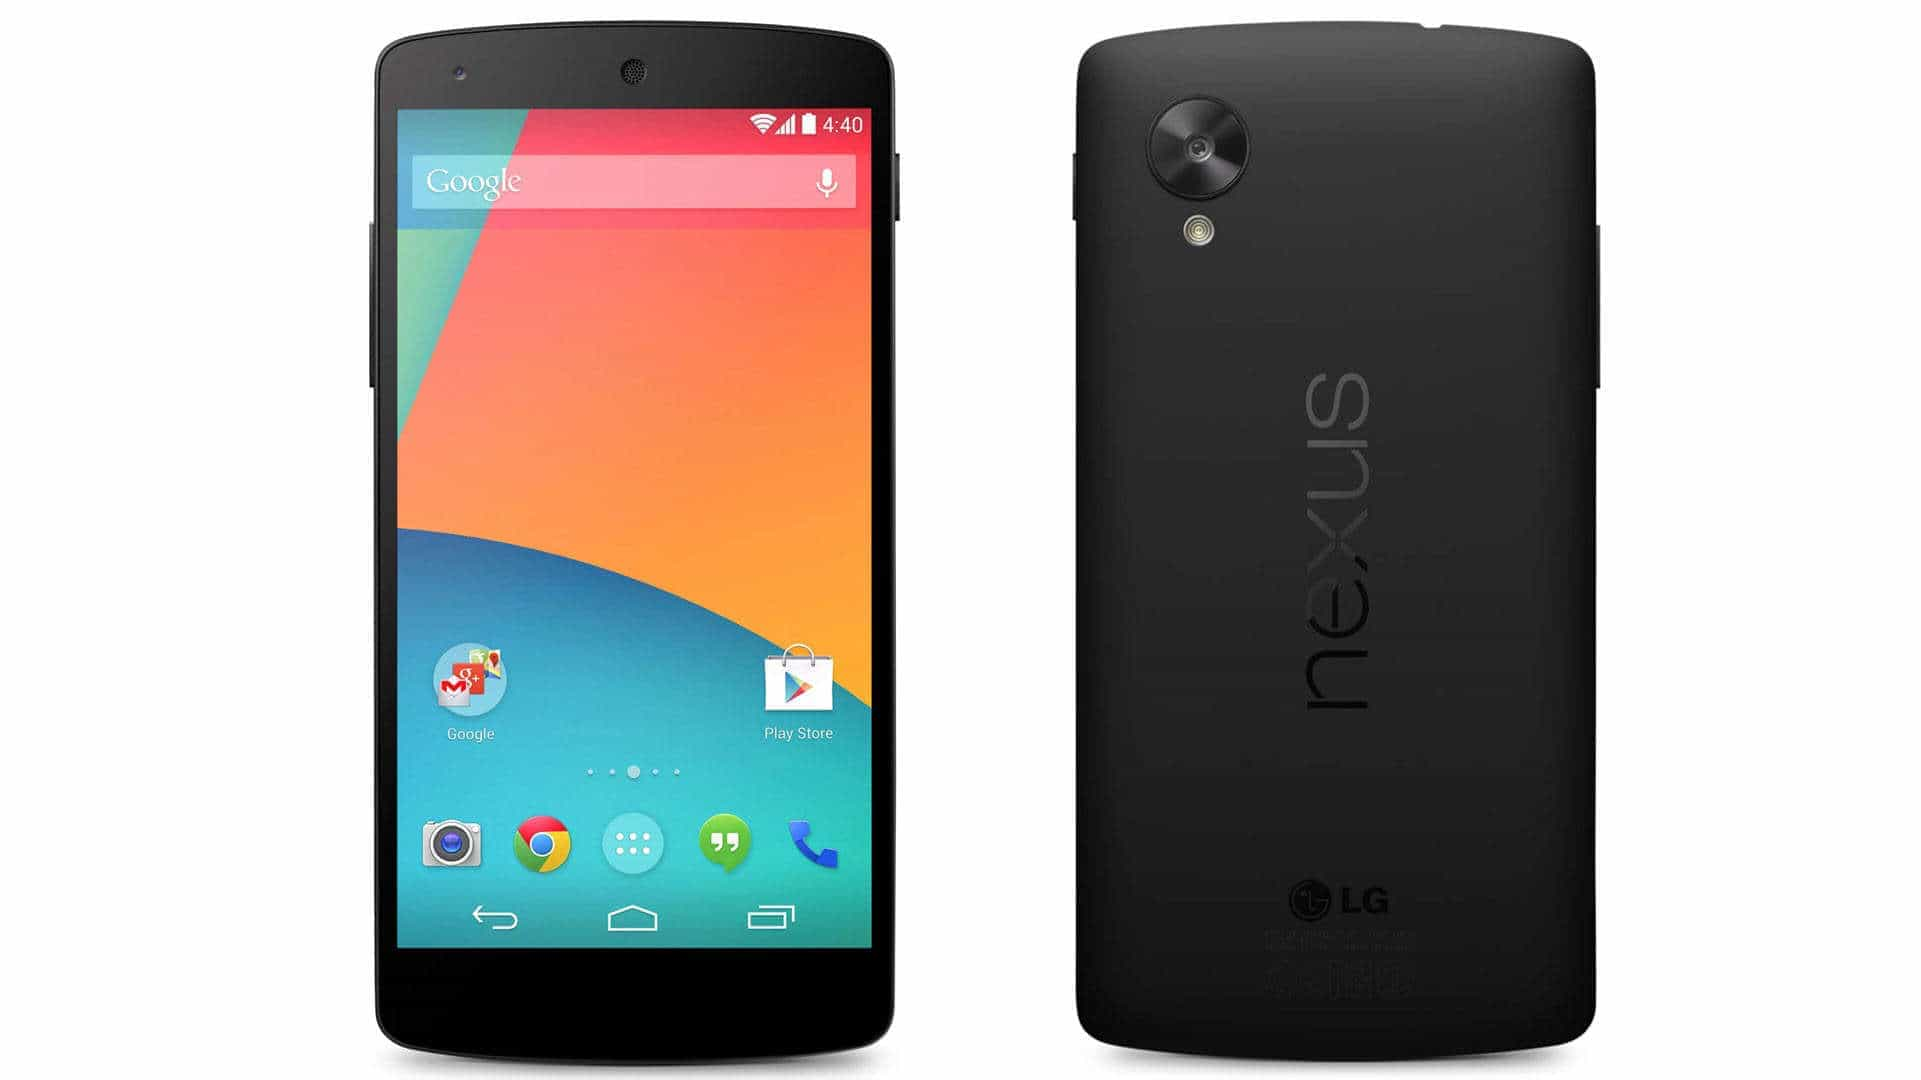 Update Nexus 5 and Nexus 7 2013 to Android 7.0 Nougat